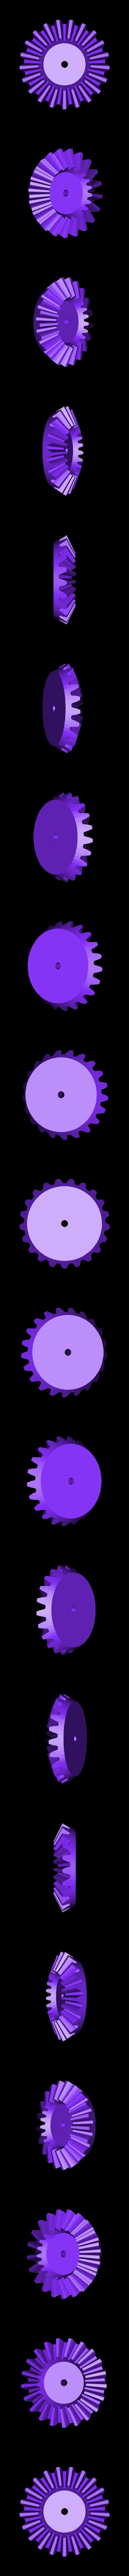 Bevel_gear_m2x21.STL Download free STL file party parrot automata • 3D printable design, melonshu